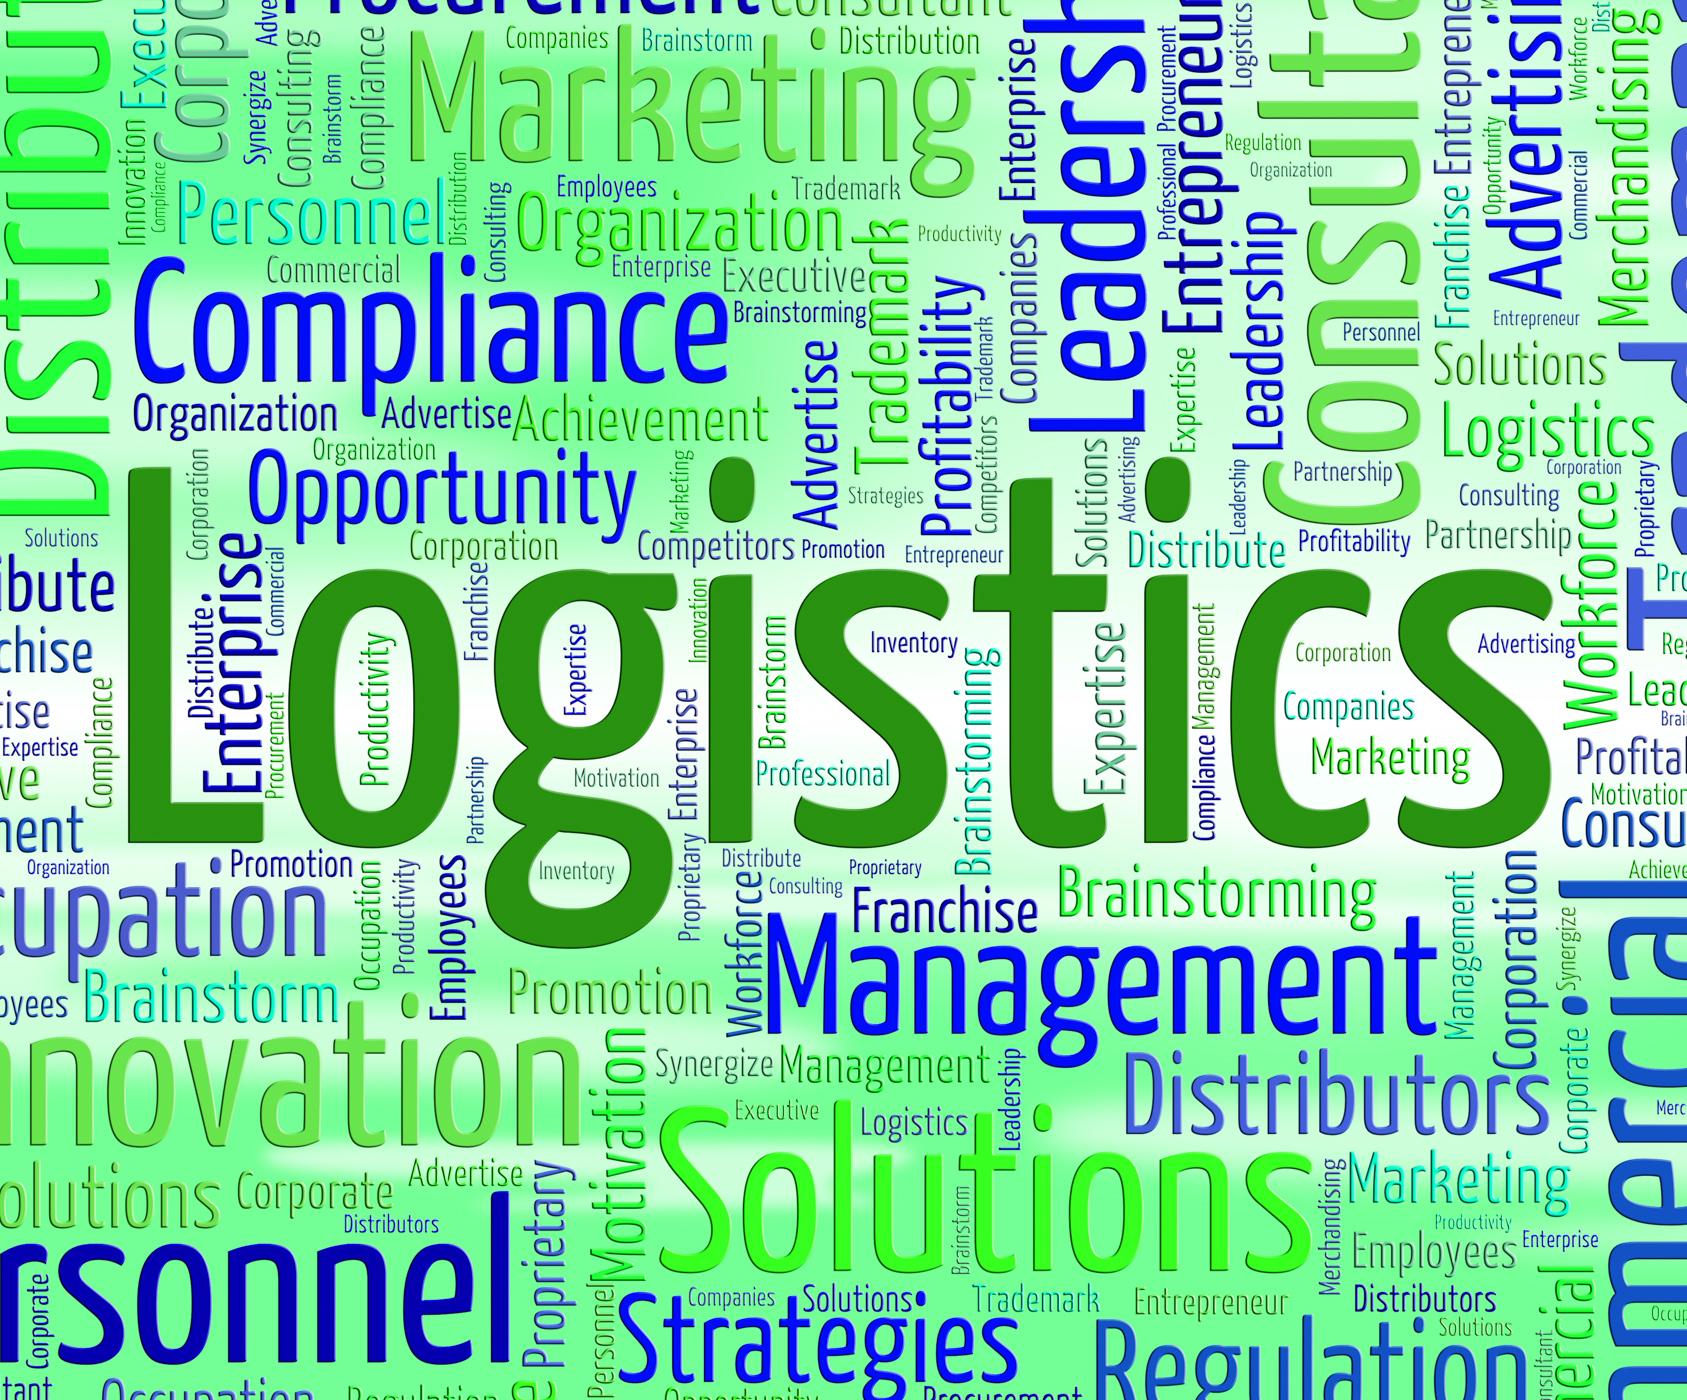 Logistics Word Represents Coordinate Wordcloud And Plans, Analysis, Plans, Wordclouds, Wordcloud, HQ Photo